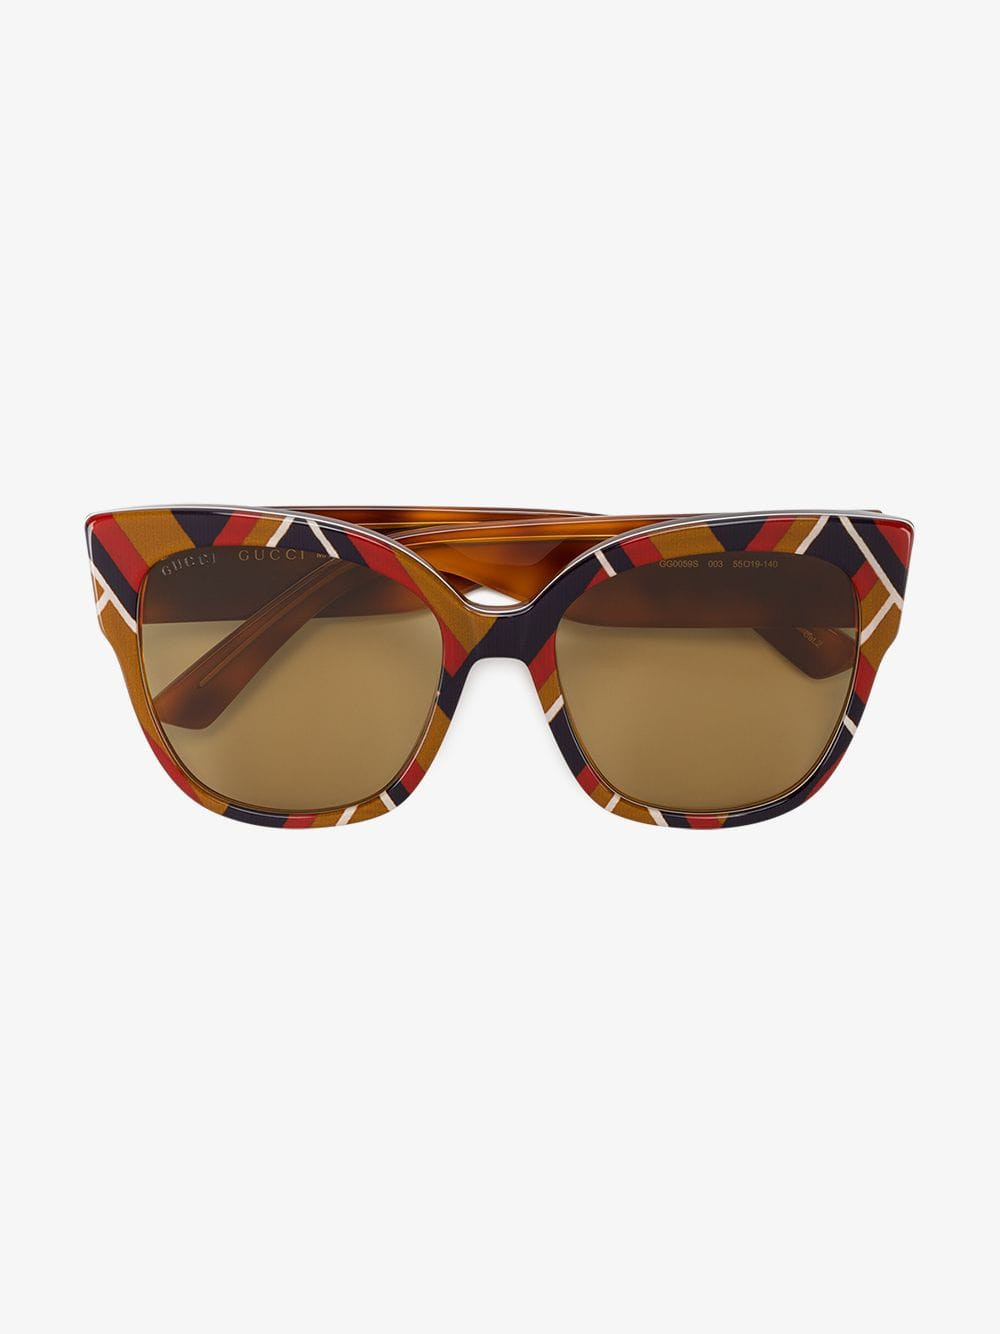 Gucci Eyewear multicoloured chevron square-frame sunglasses in brown